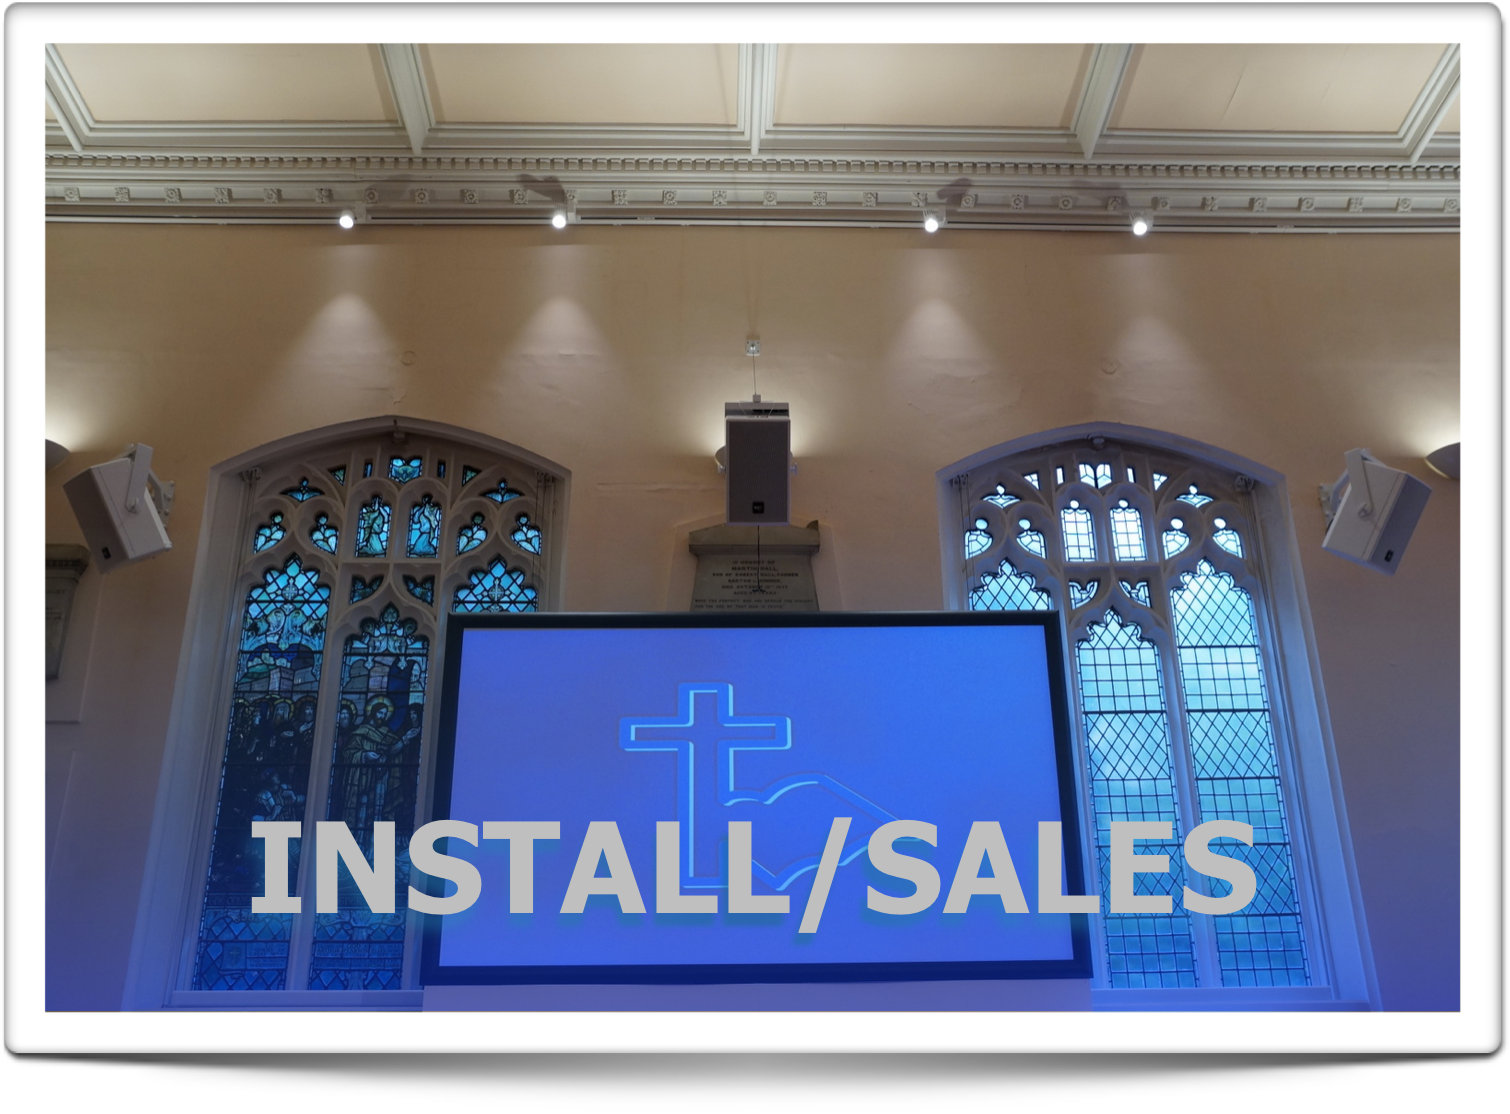 Install/Sales